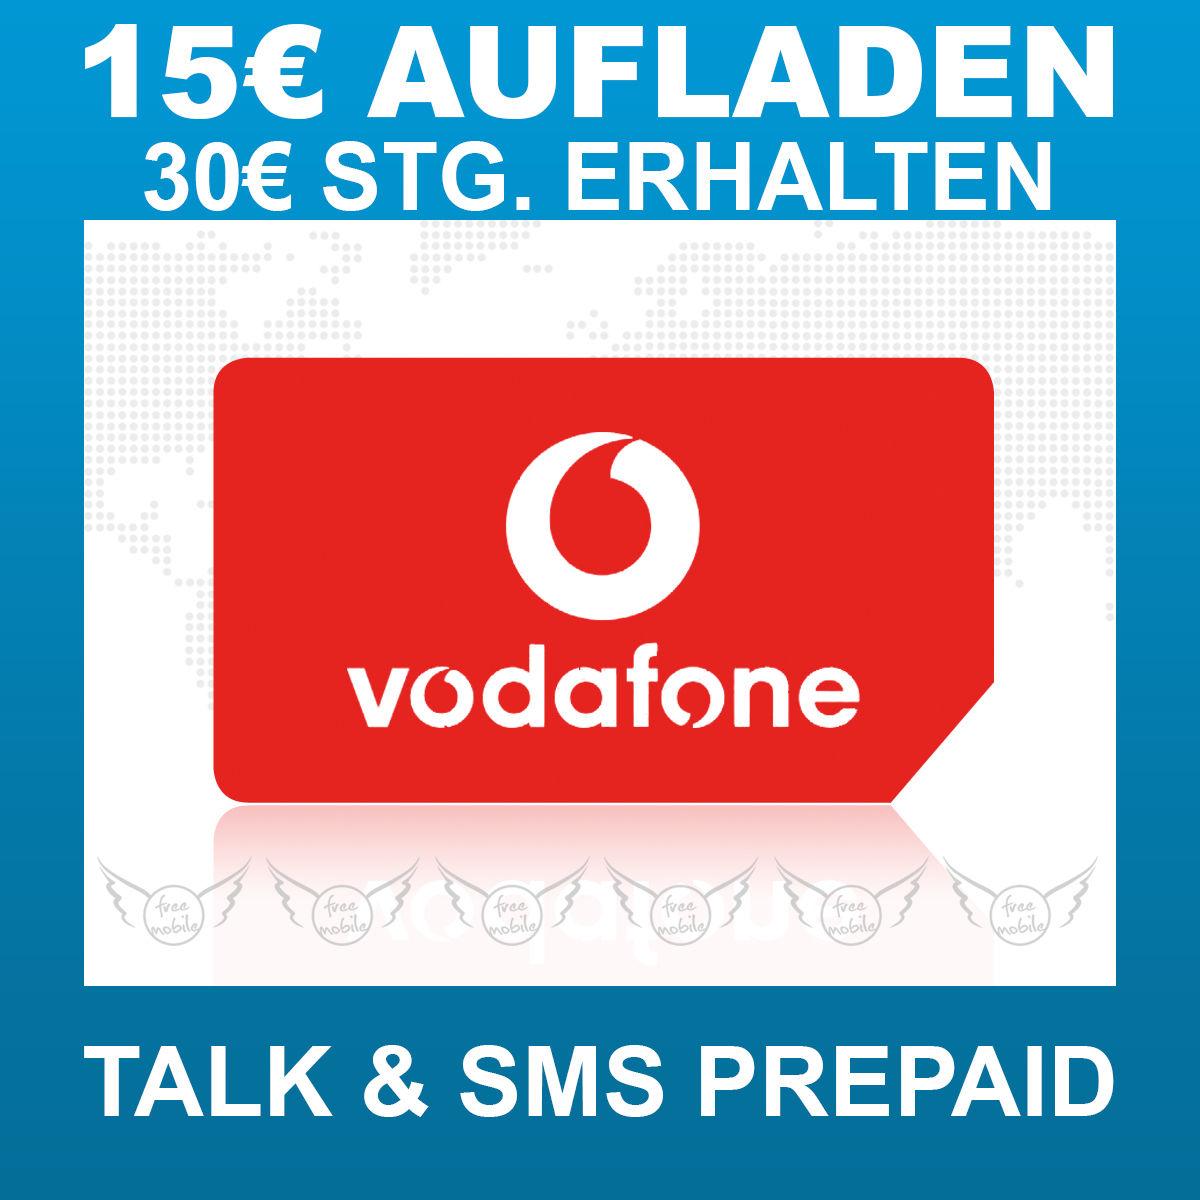 vodafone prepaid karte talk sms d2 callya prepaid sim karte talk sms tarif ebay. Black Bedroom Furniture Sets. Home Design Ideas